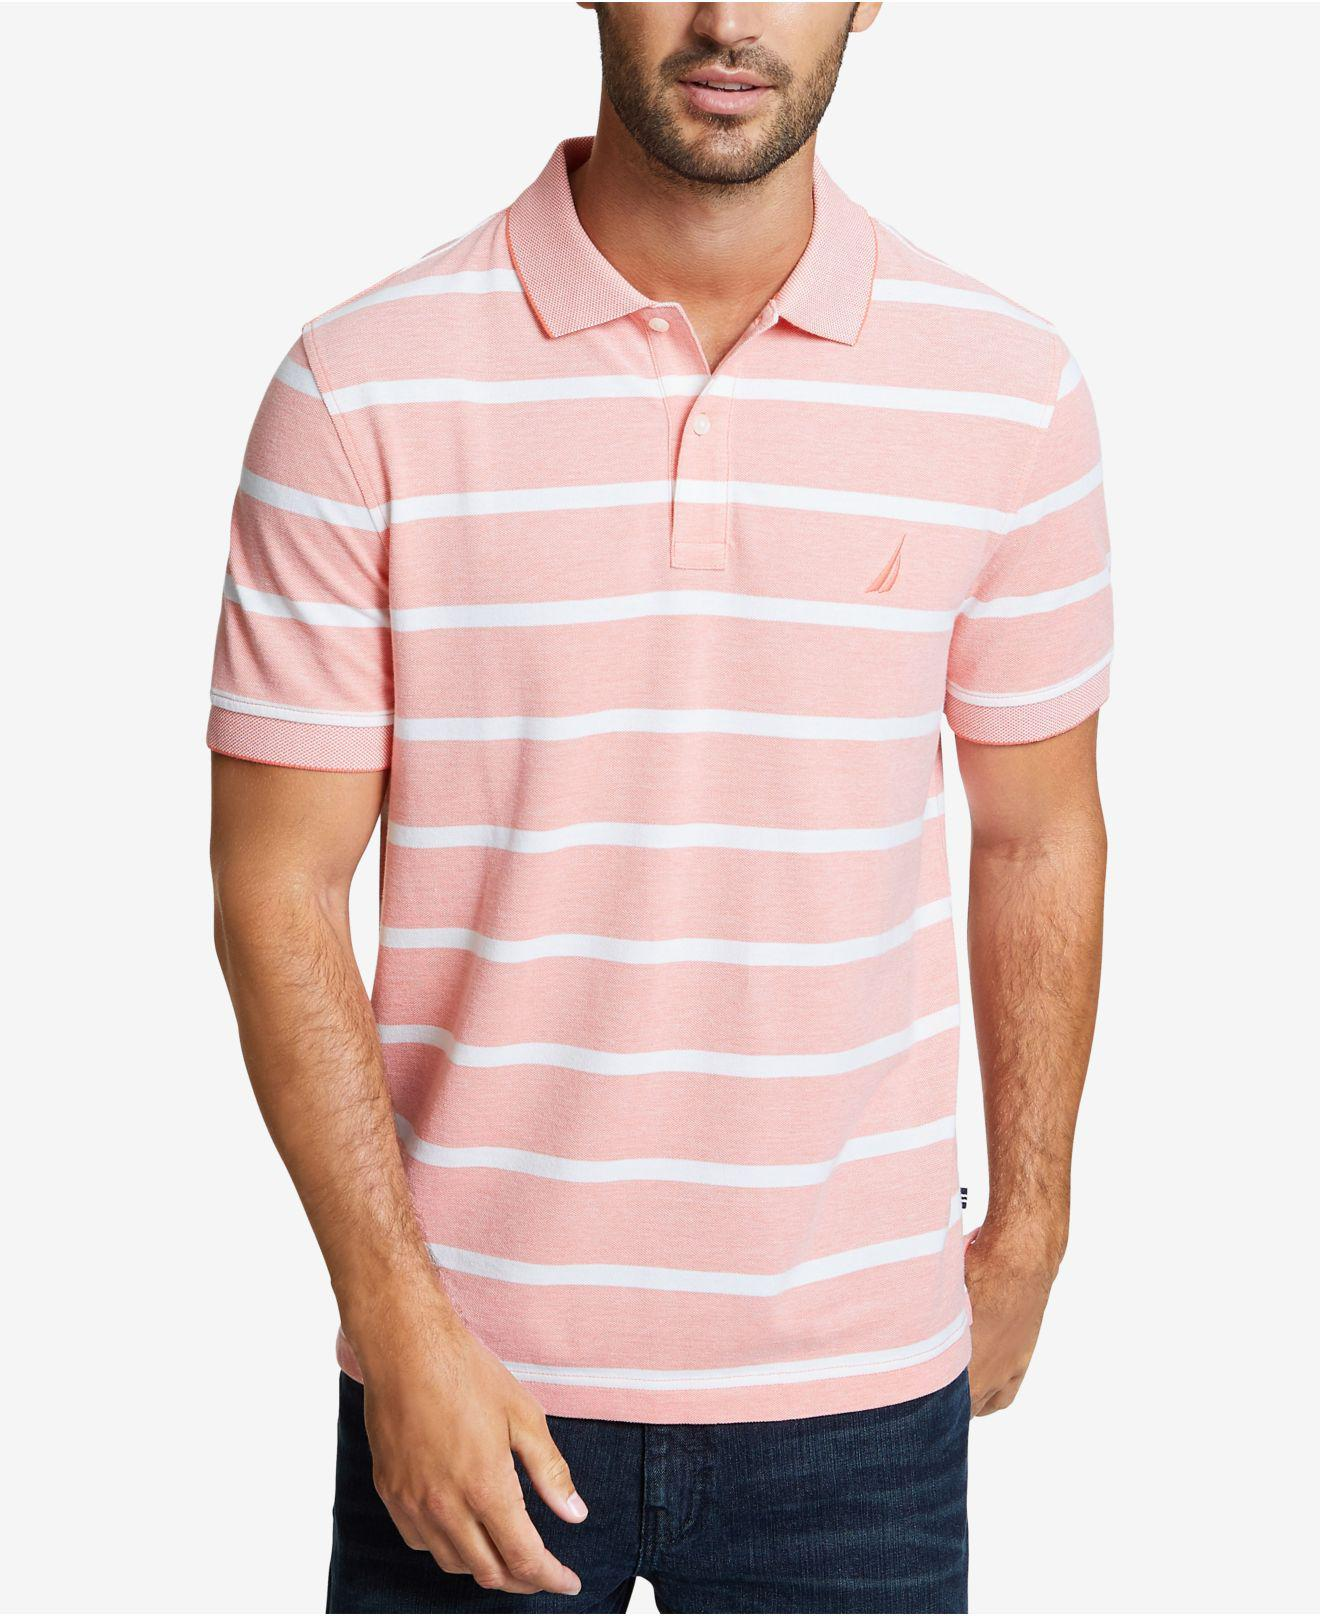 a2052e86 Lyst - Nautica Kailua Stripe Oxford Polo in Pink for Men - Save ...